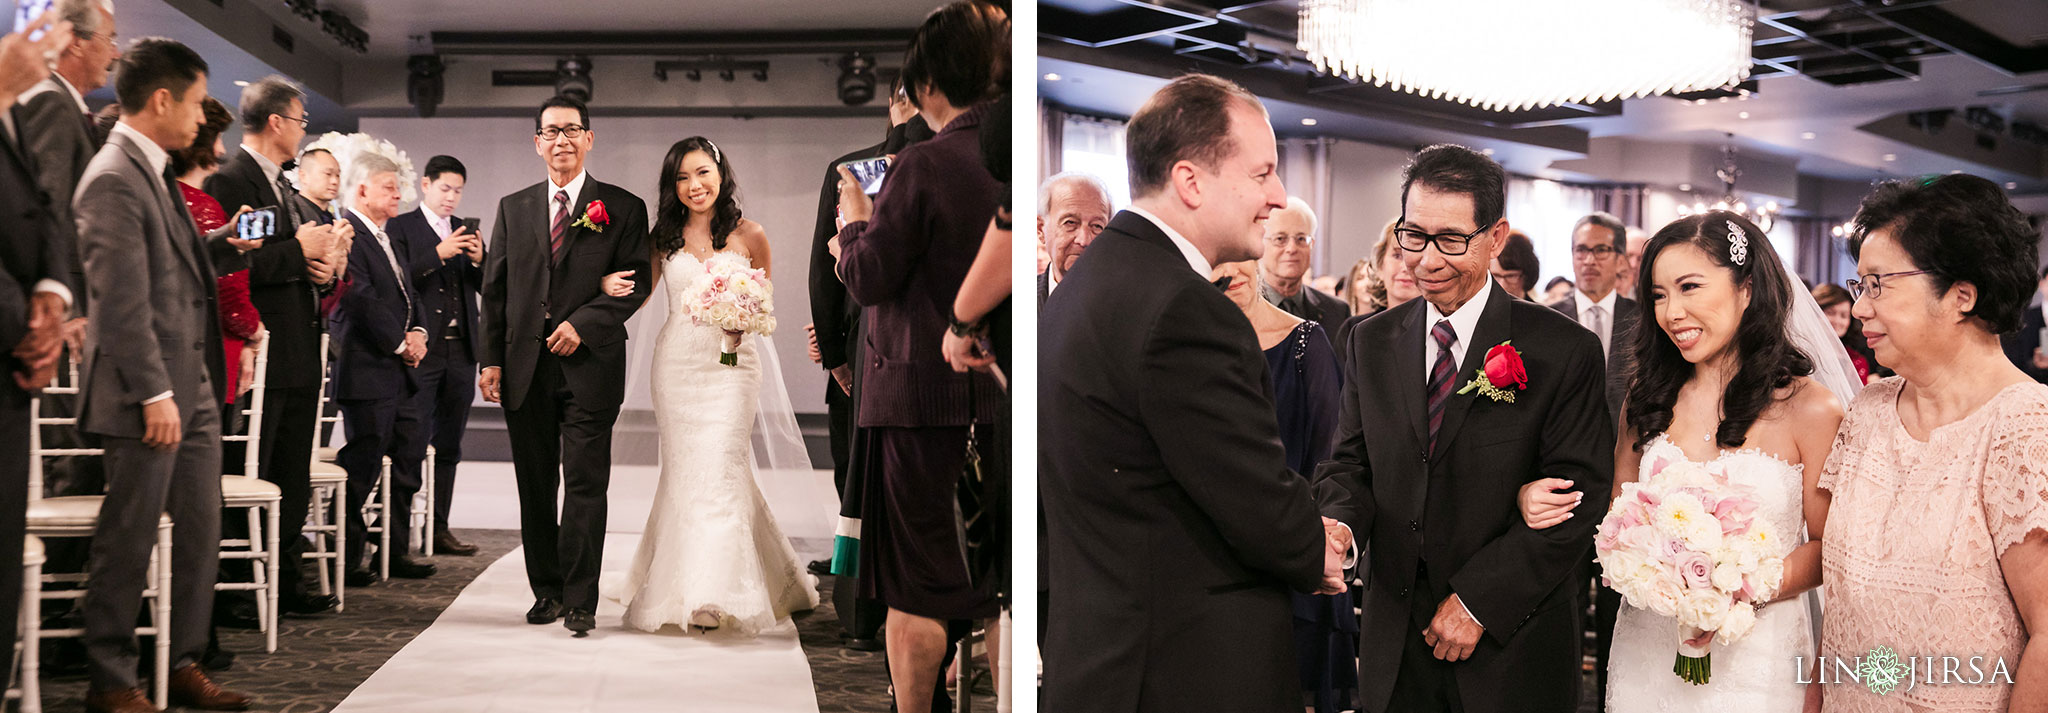 22 vertigo banquet hall glendale wedding photography